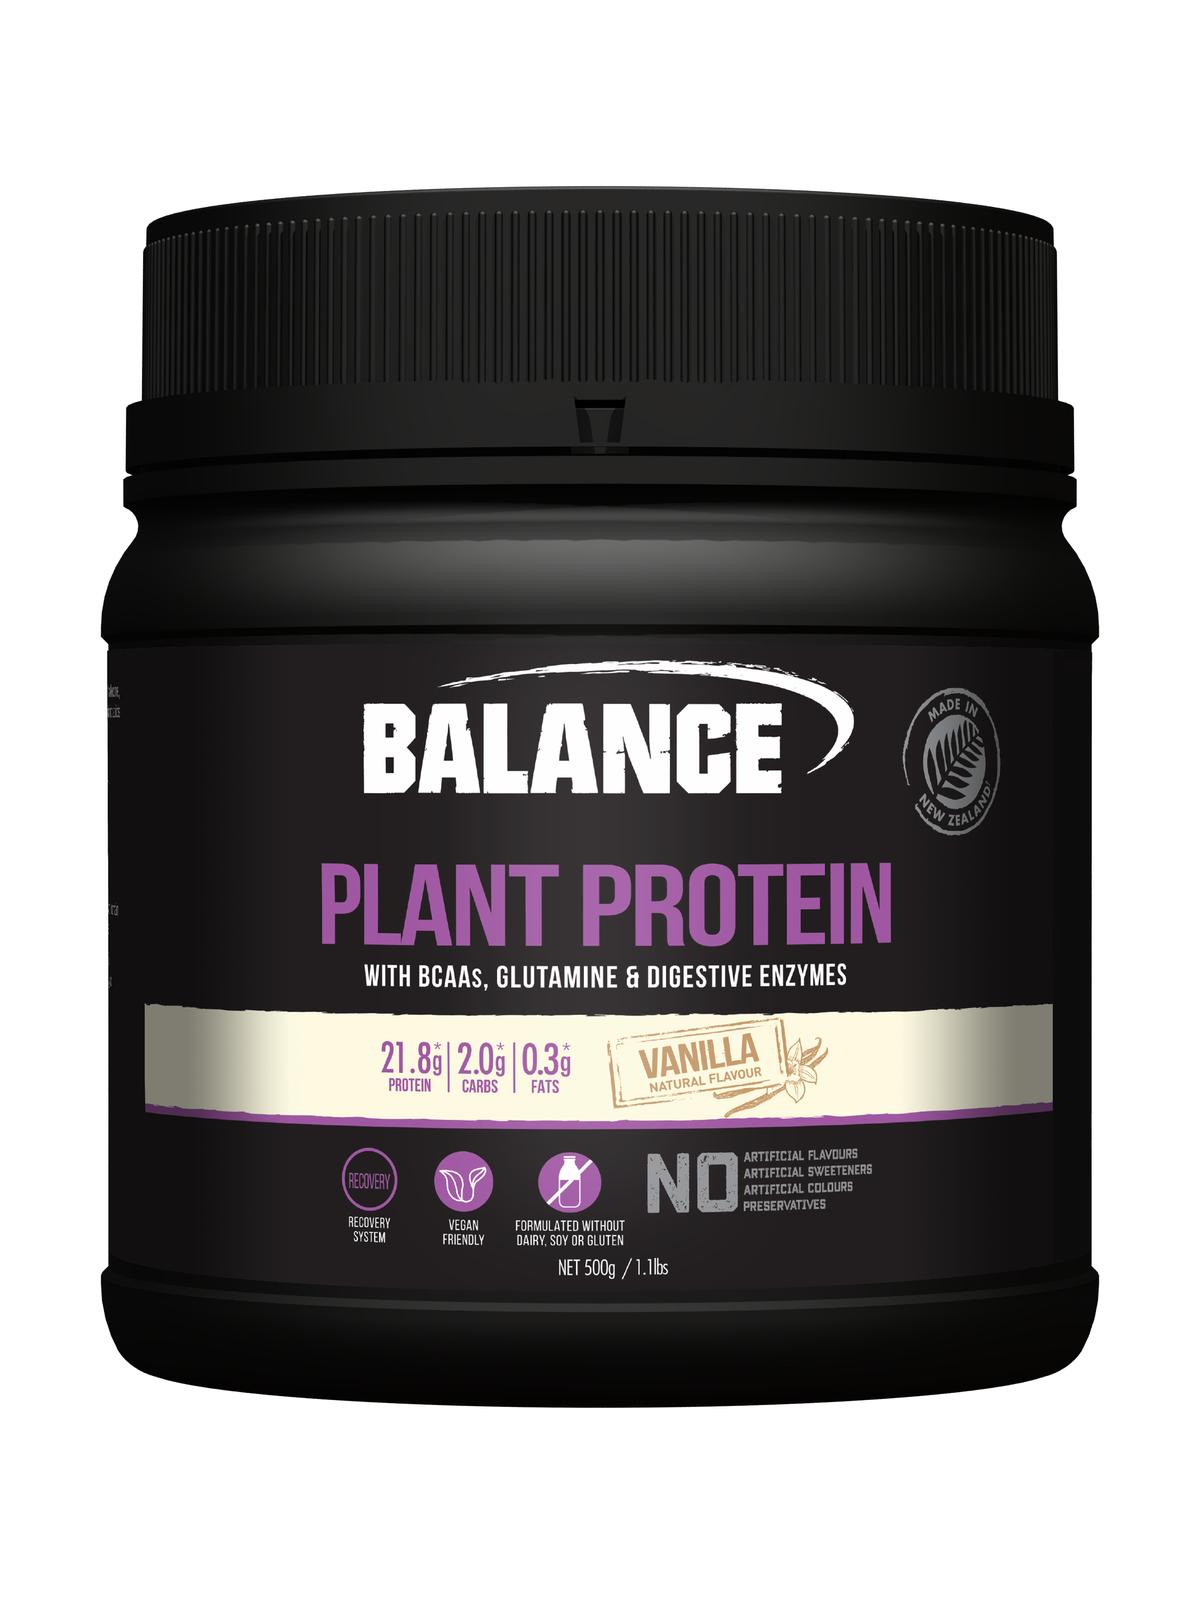 Balance Plant Protein image